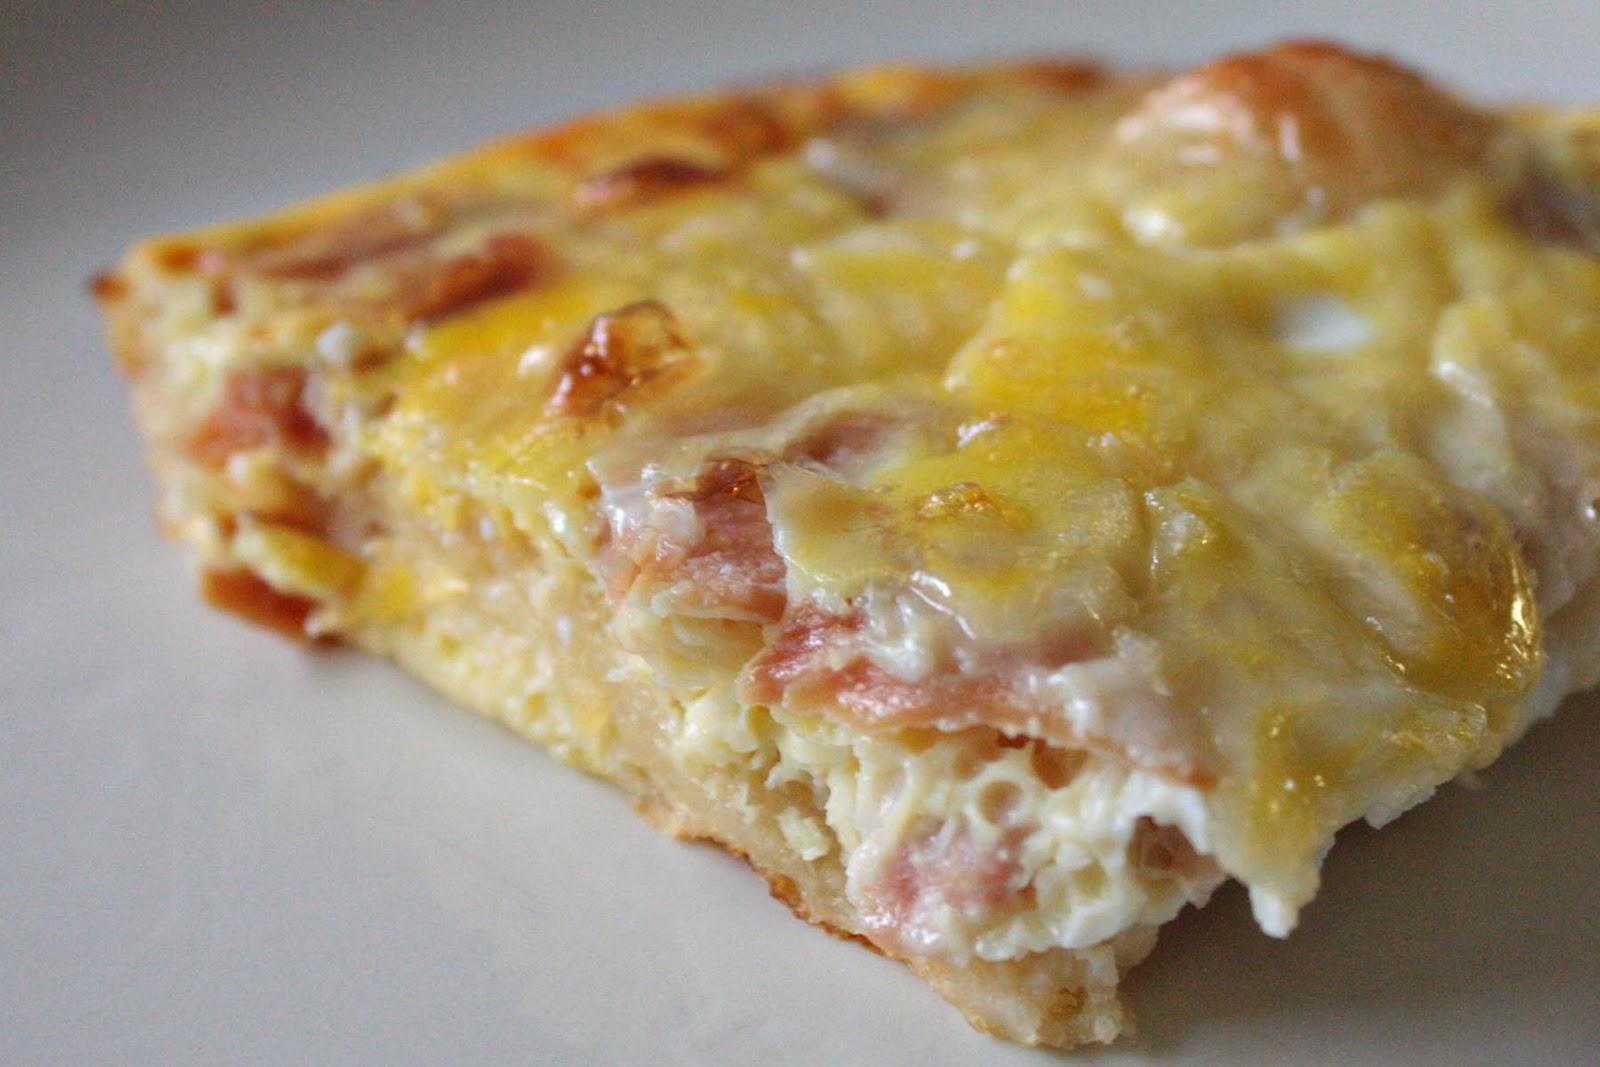 Momma Hen's Kitchen: Bacon, Egg, and Cheese Breakfast Casserole